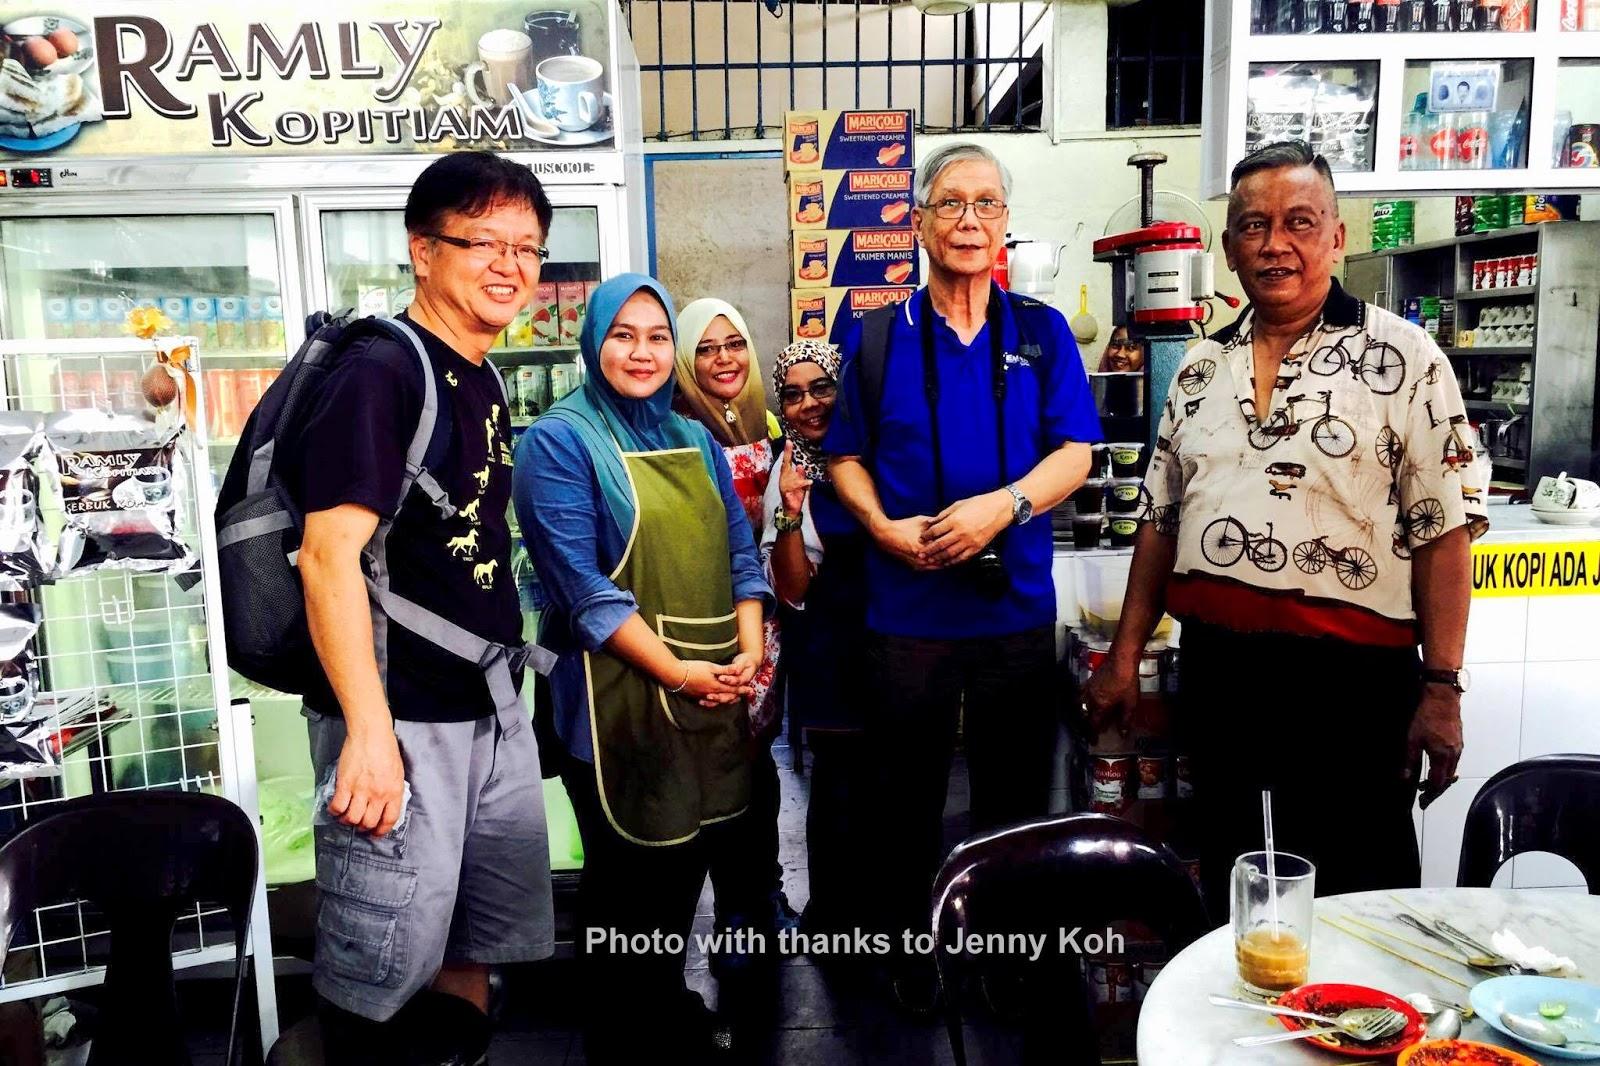 batu pahat lesbian personals Local malay girls for massage skudai: women searching for men: ricky 7577 07-5214969: short-term relationship: 21: johor johor bahru.